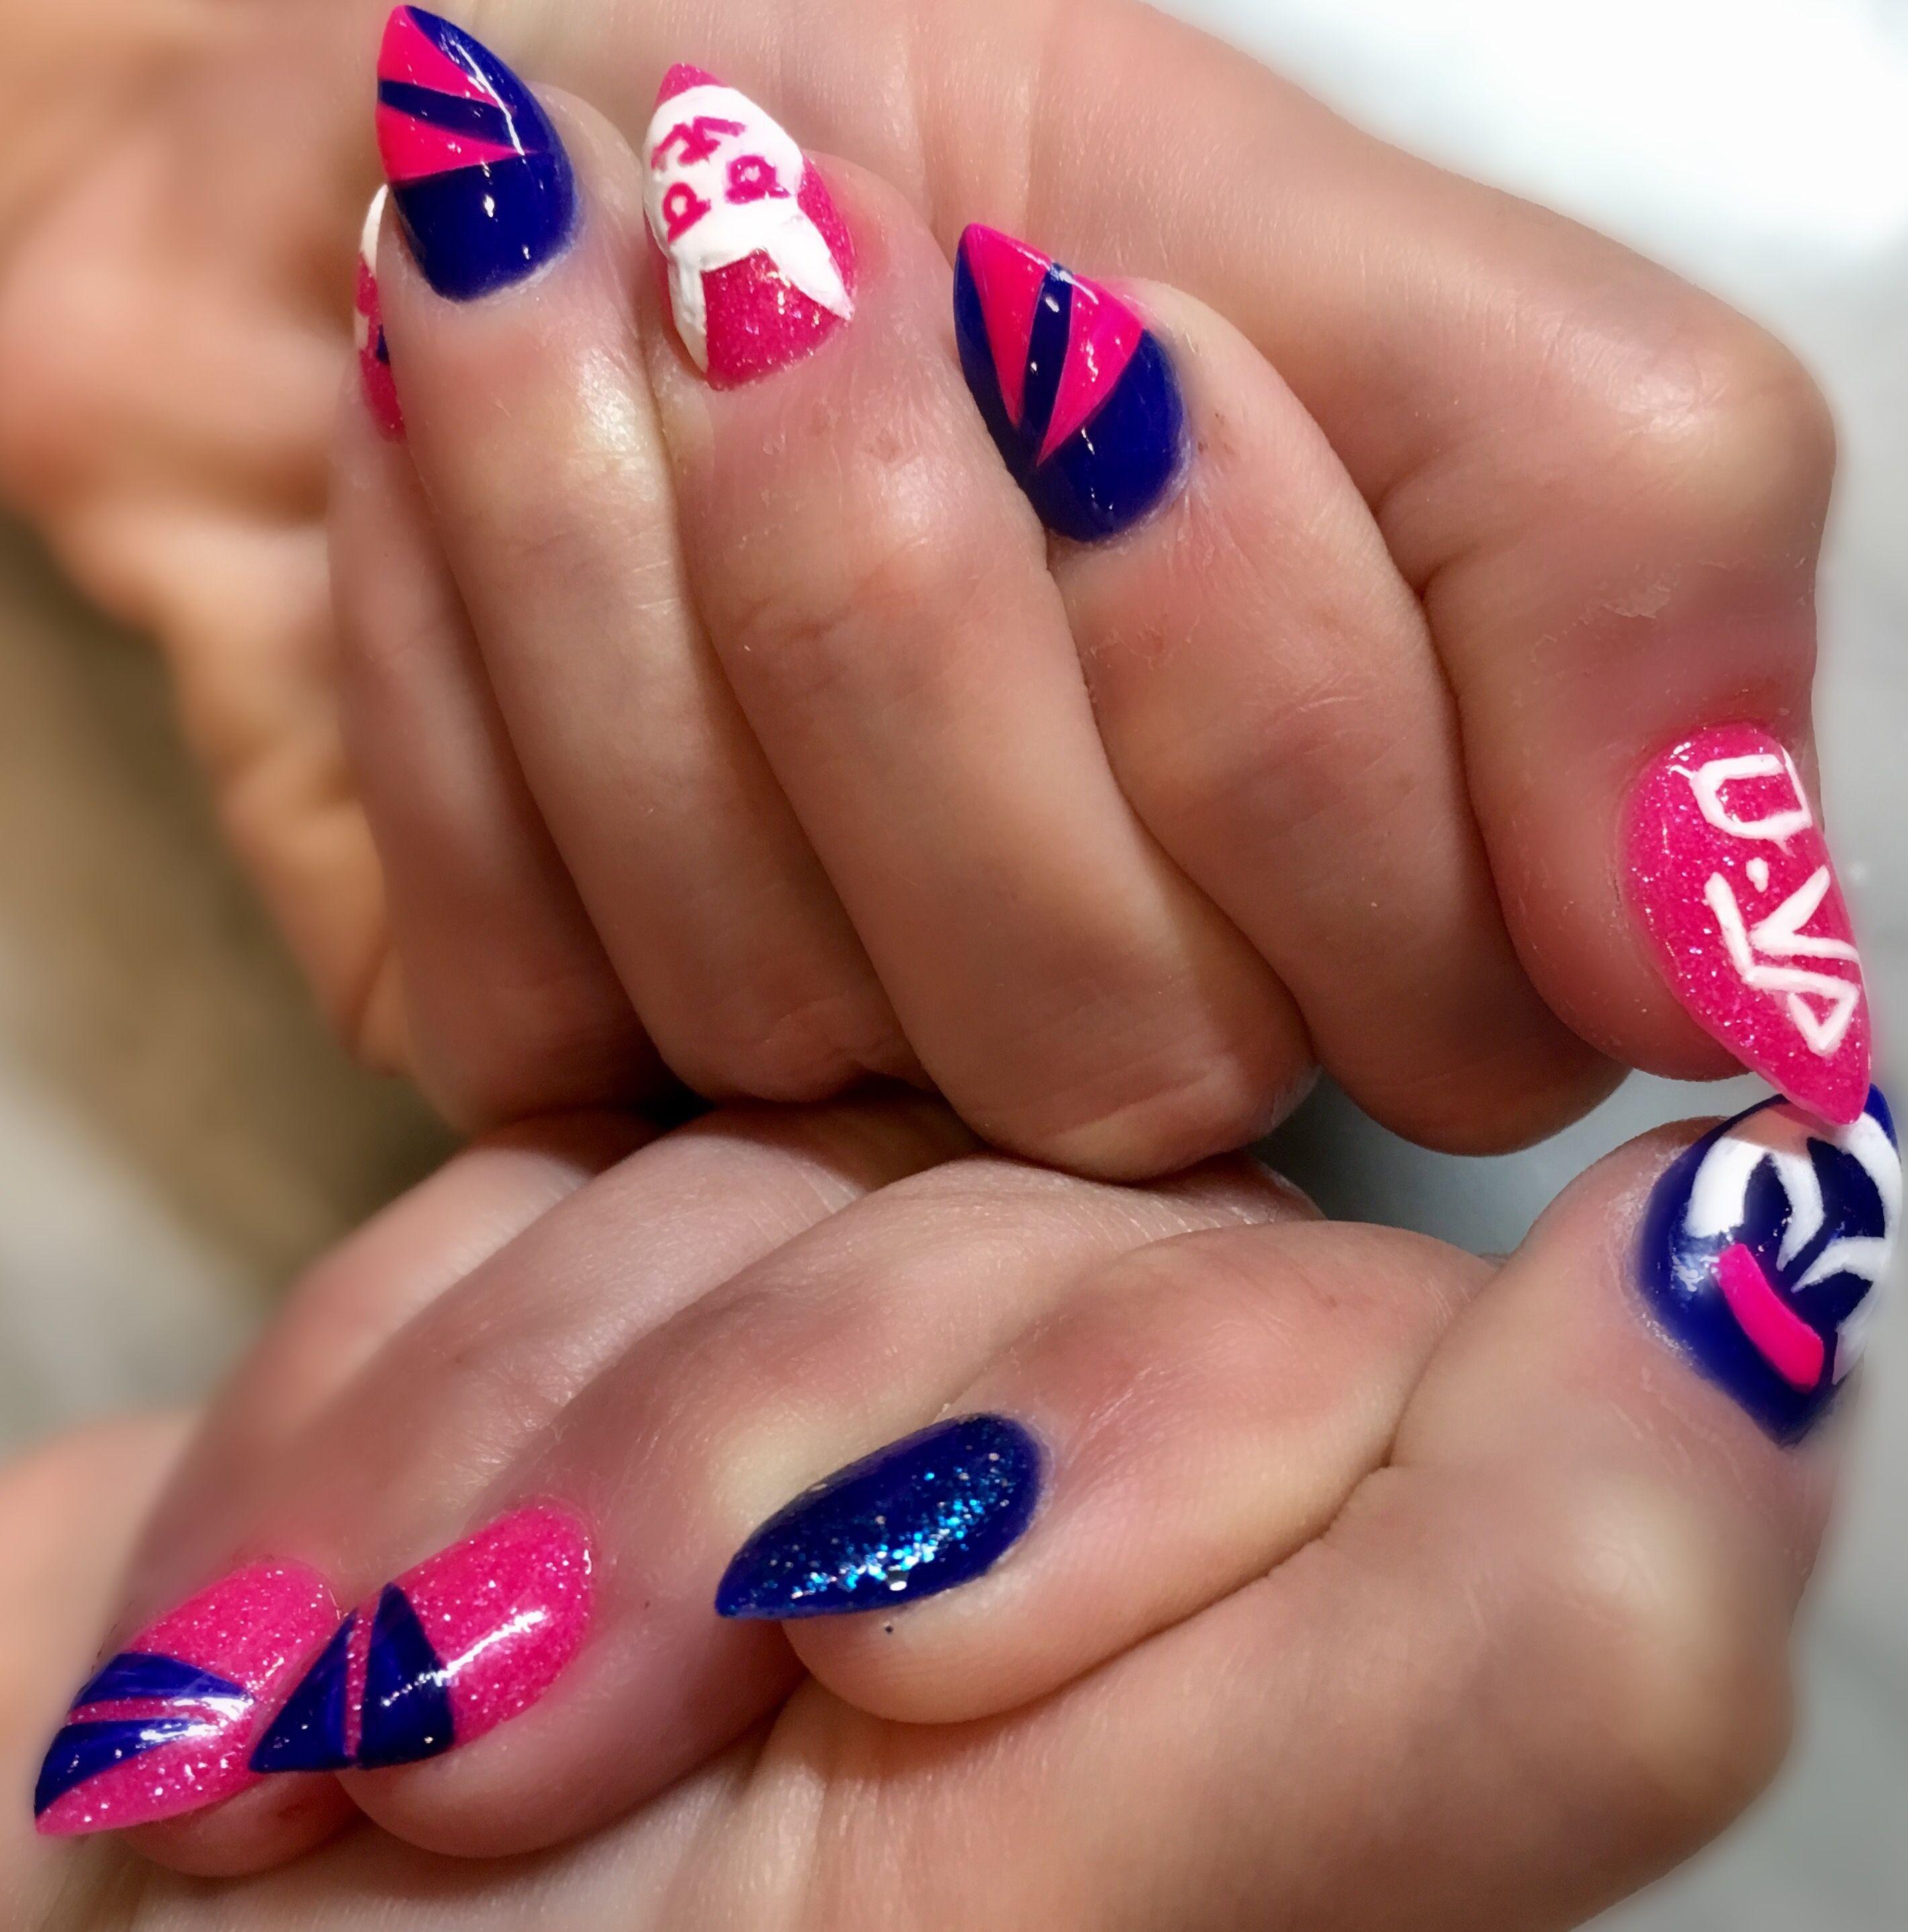 Overwatch nail art! #DVA #Overwatch #Nailart   Nails Nails Nails ...